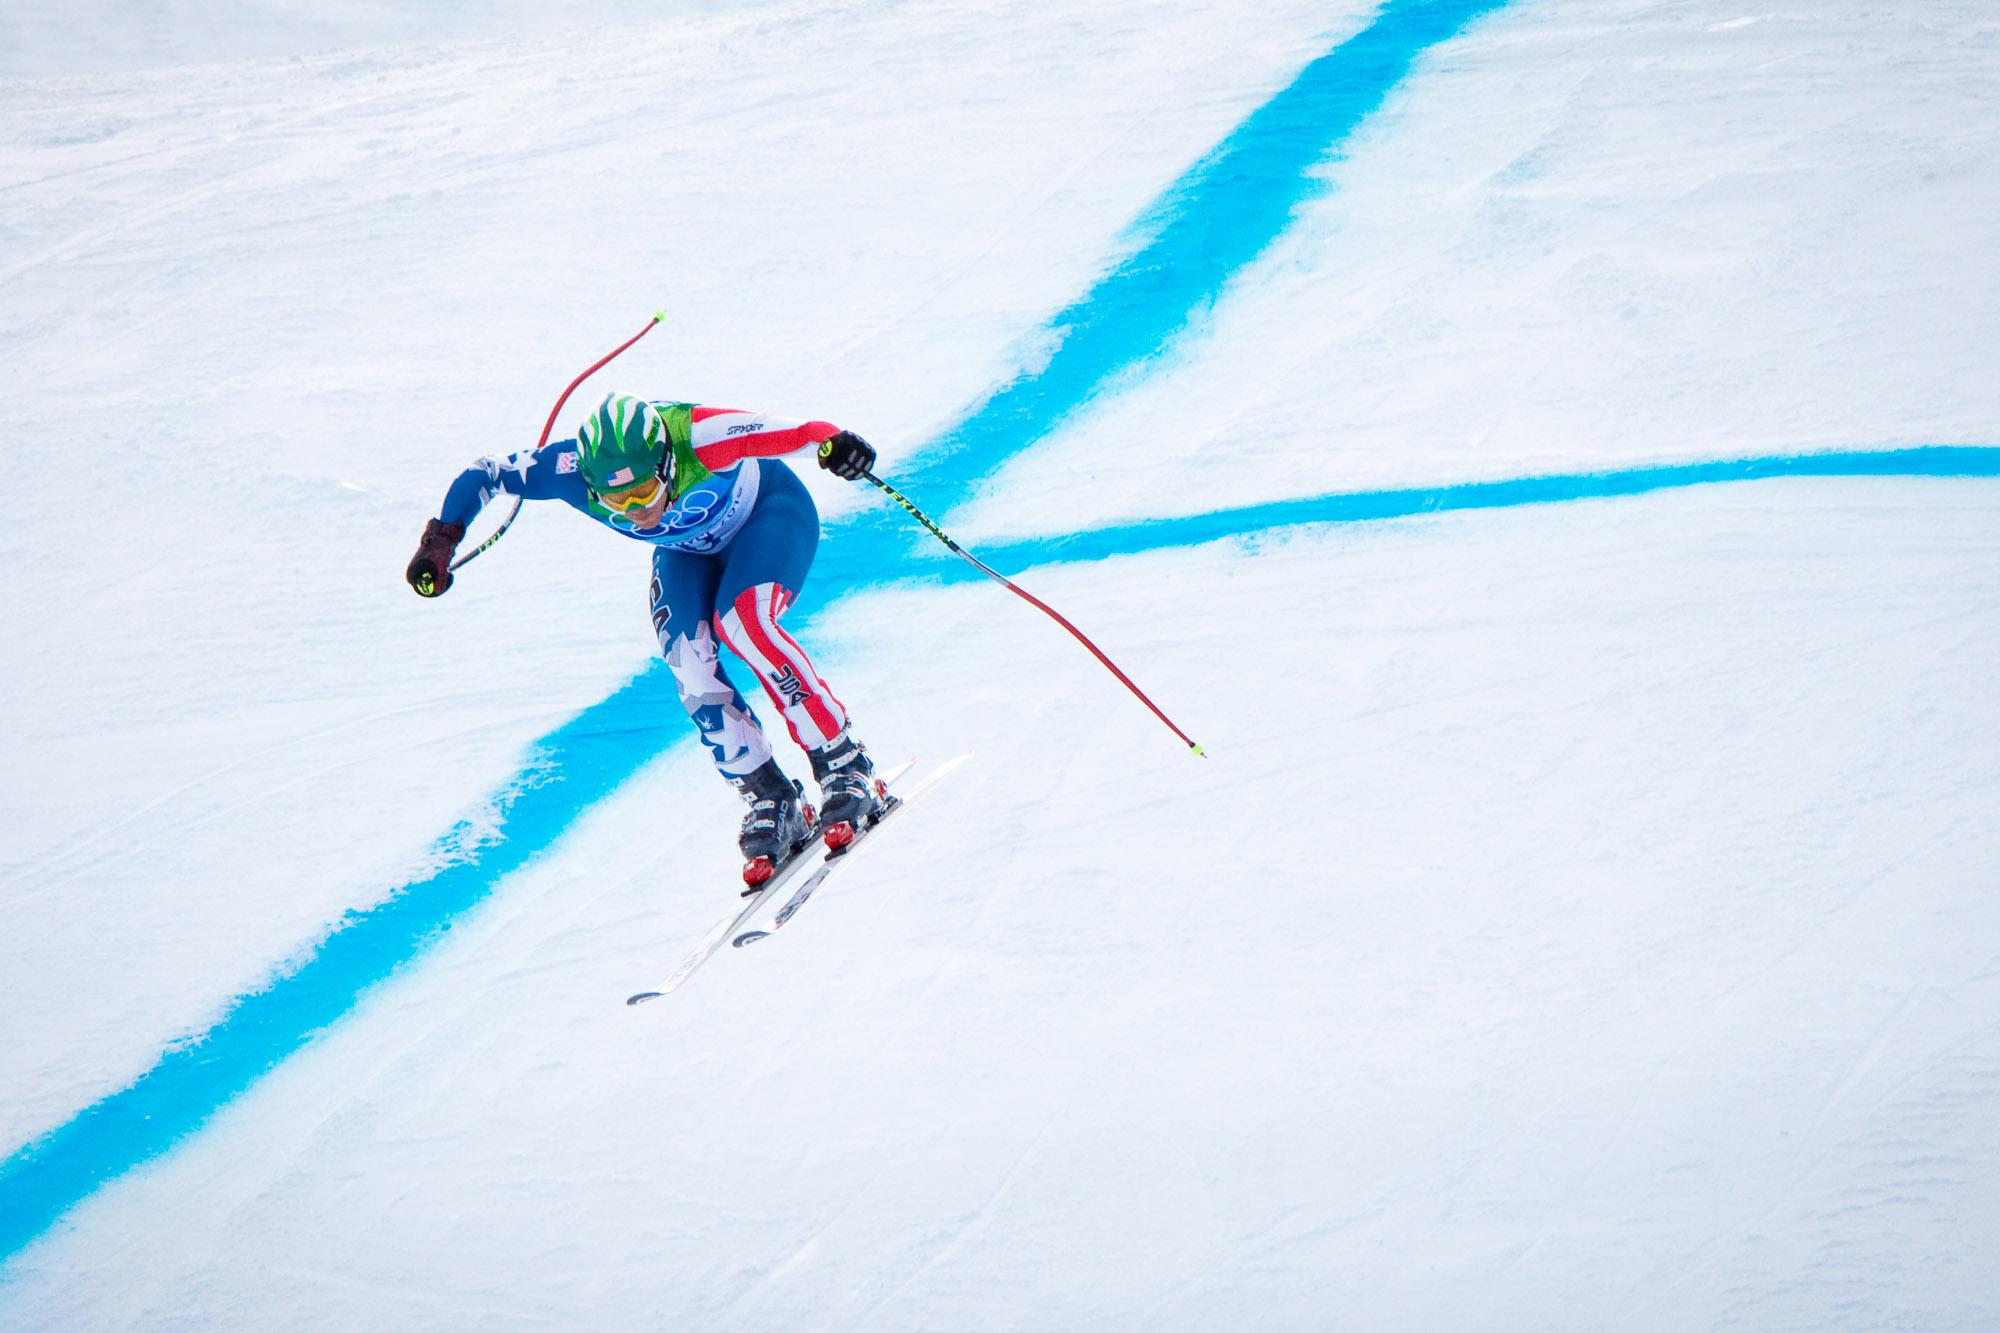 Justa-Jeskova-sport-events-photography-JJ006642.jpg